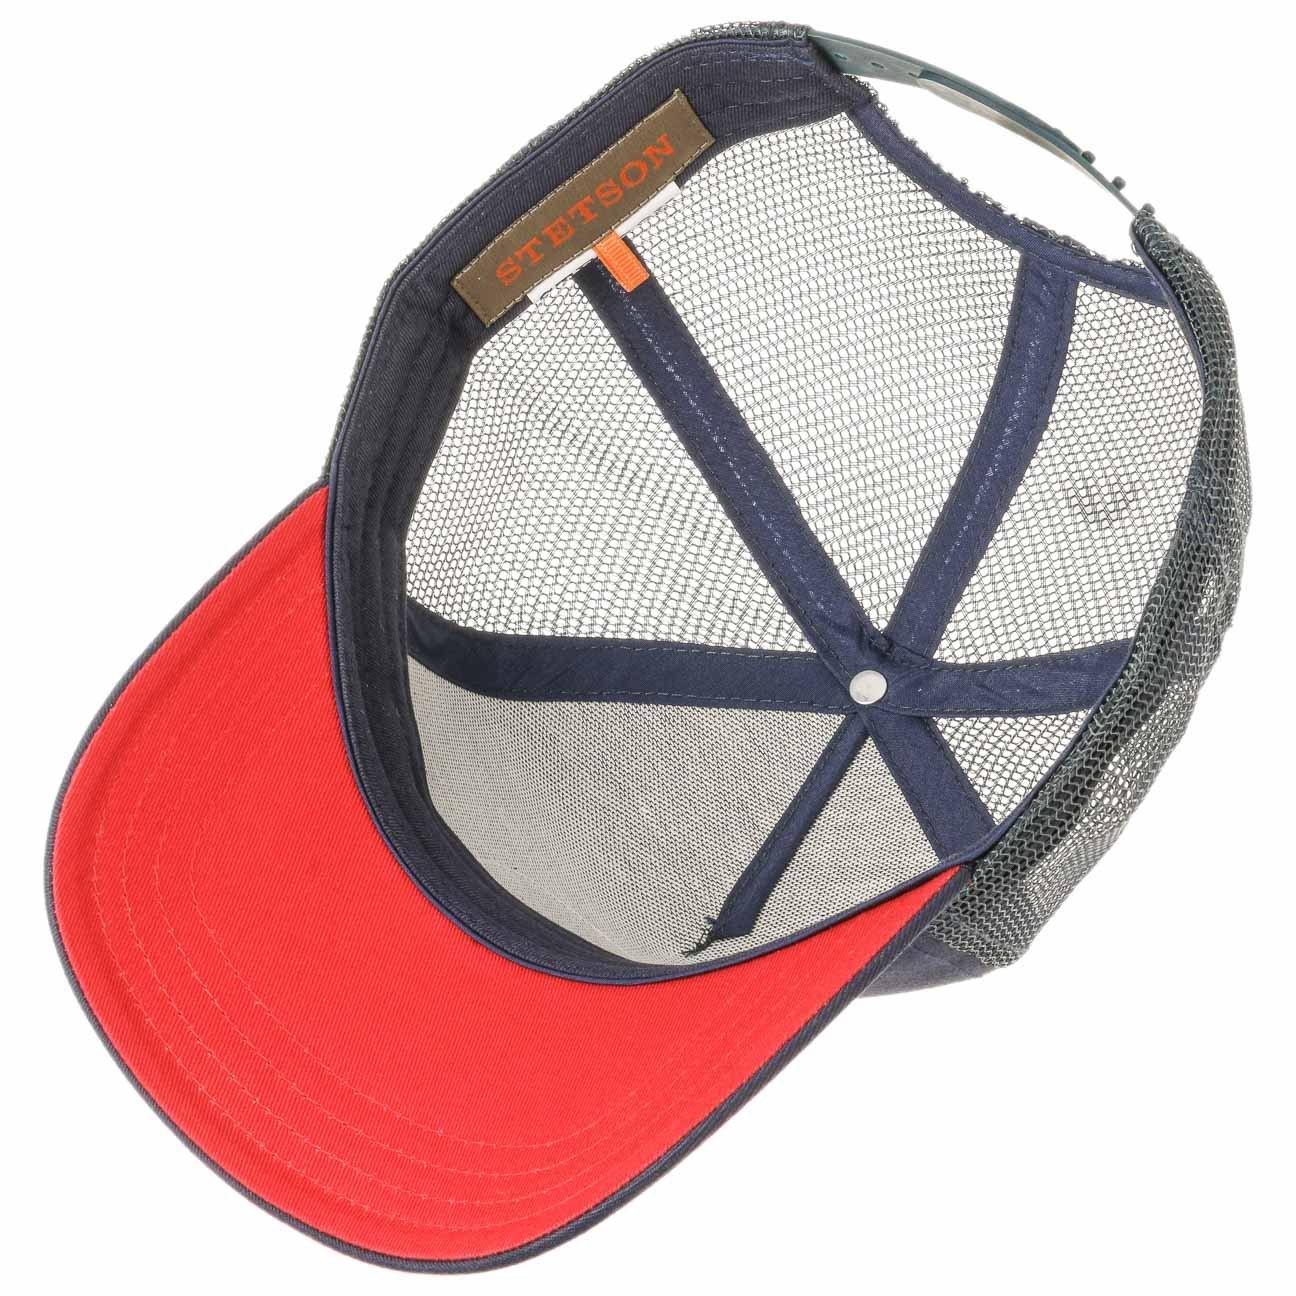 Stetson JBS-Cavalry Trucker Baseball Mesh Cap (One Size - Beige-Blue)   Amazon.co.uk  Clothing 189e47cc2ea